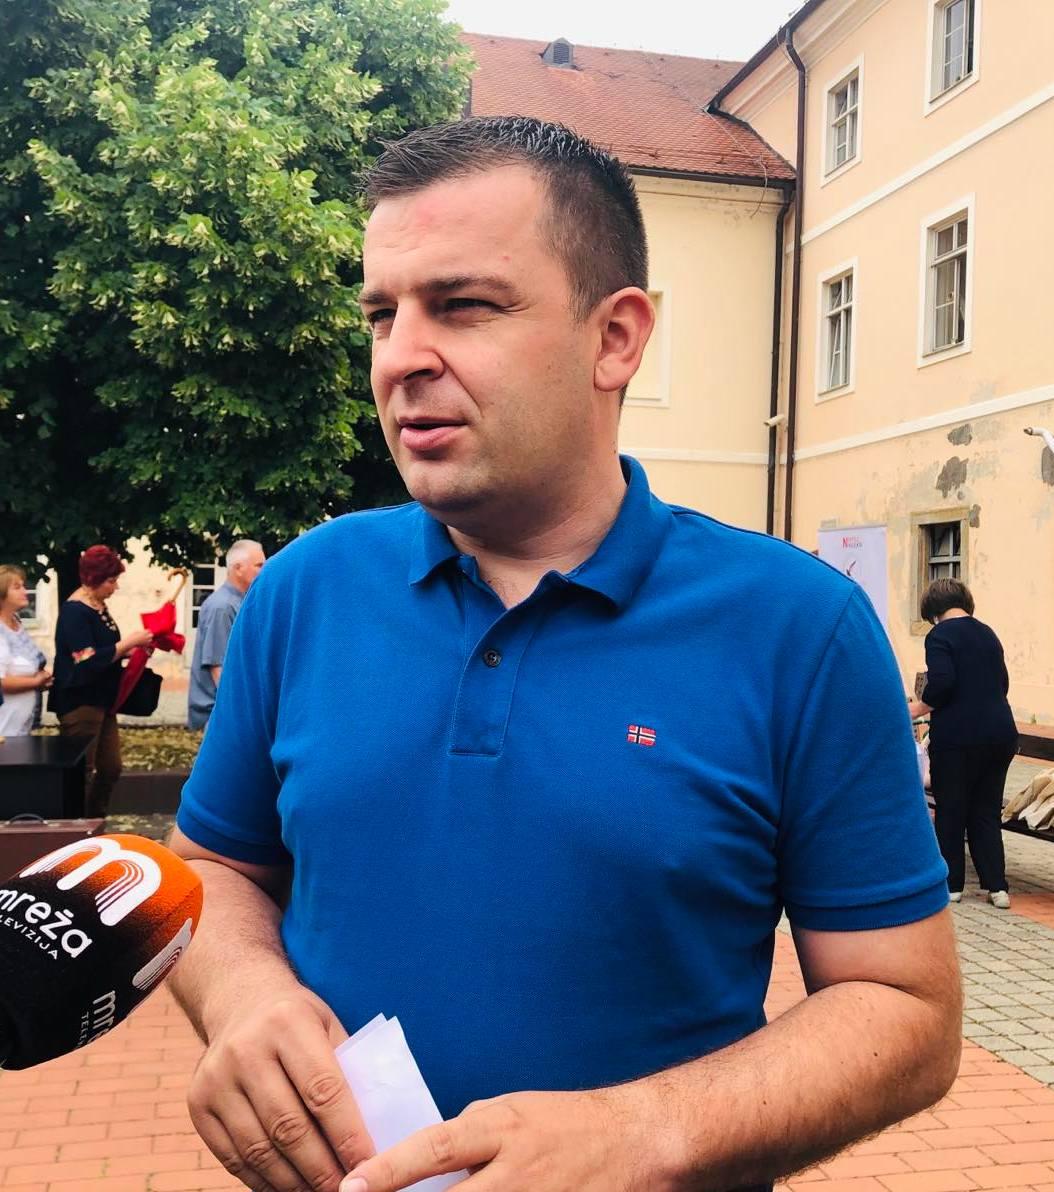 grad bjelovar najava projekta 4